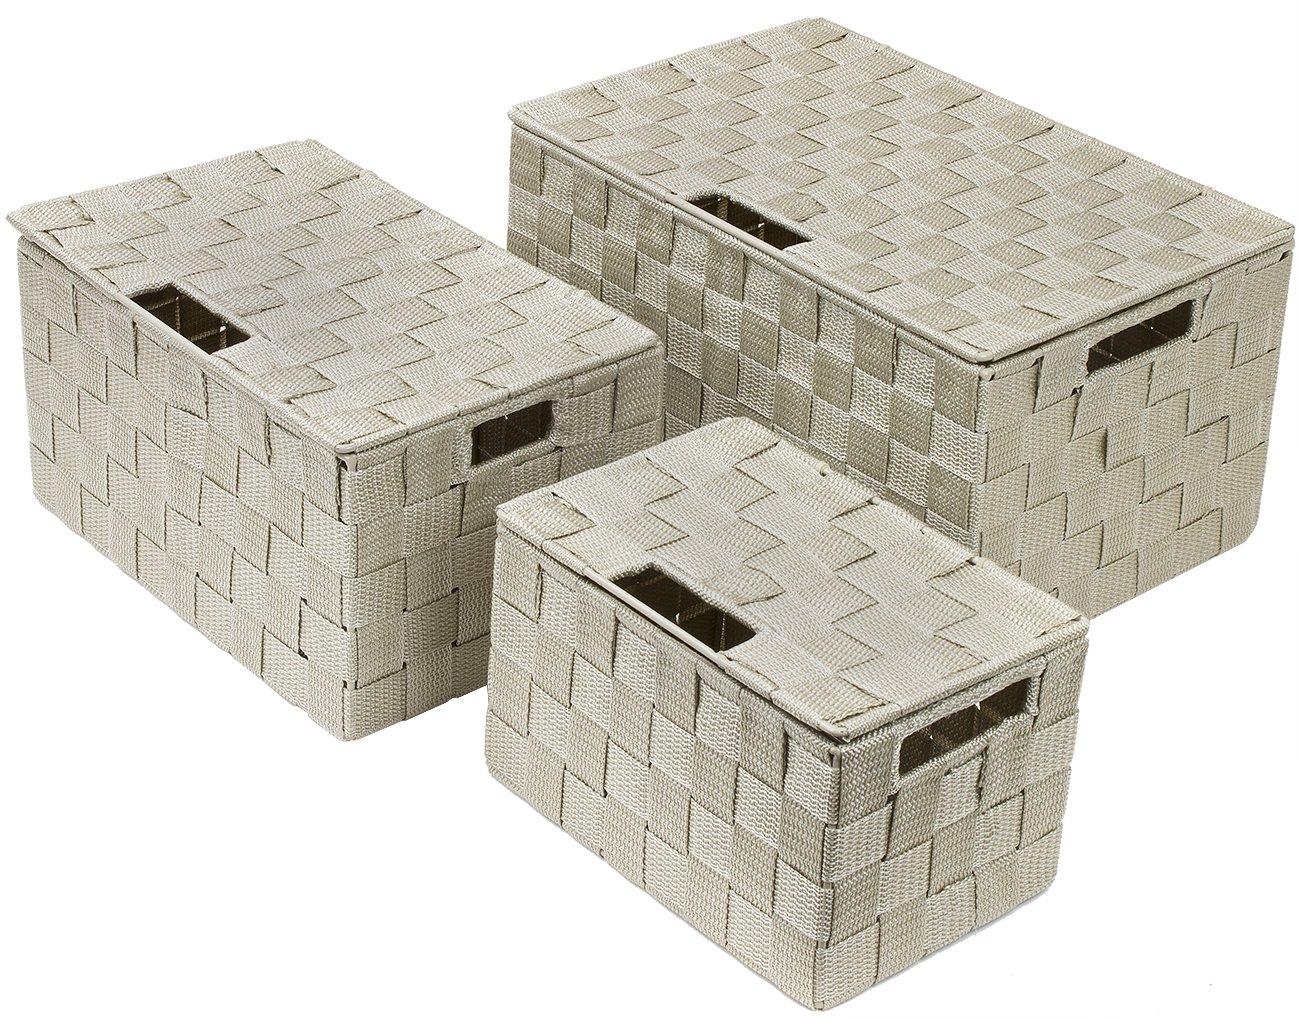 Sorbus Storage Box Woven Basket Bin Container Tote Cube Organizer Set Stackable Storage Basket Woven Strap Shelf Organizer Built-in Carry Handles Gray WEV2-GRYA